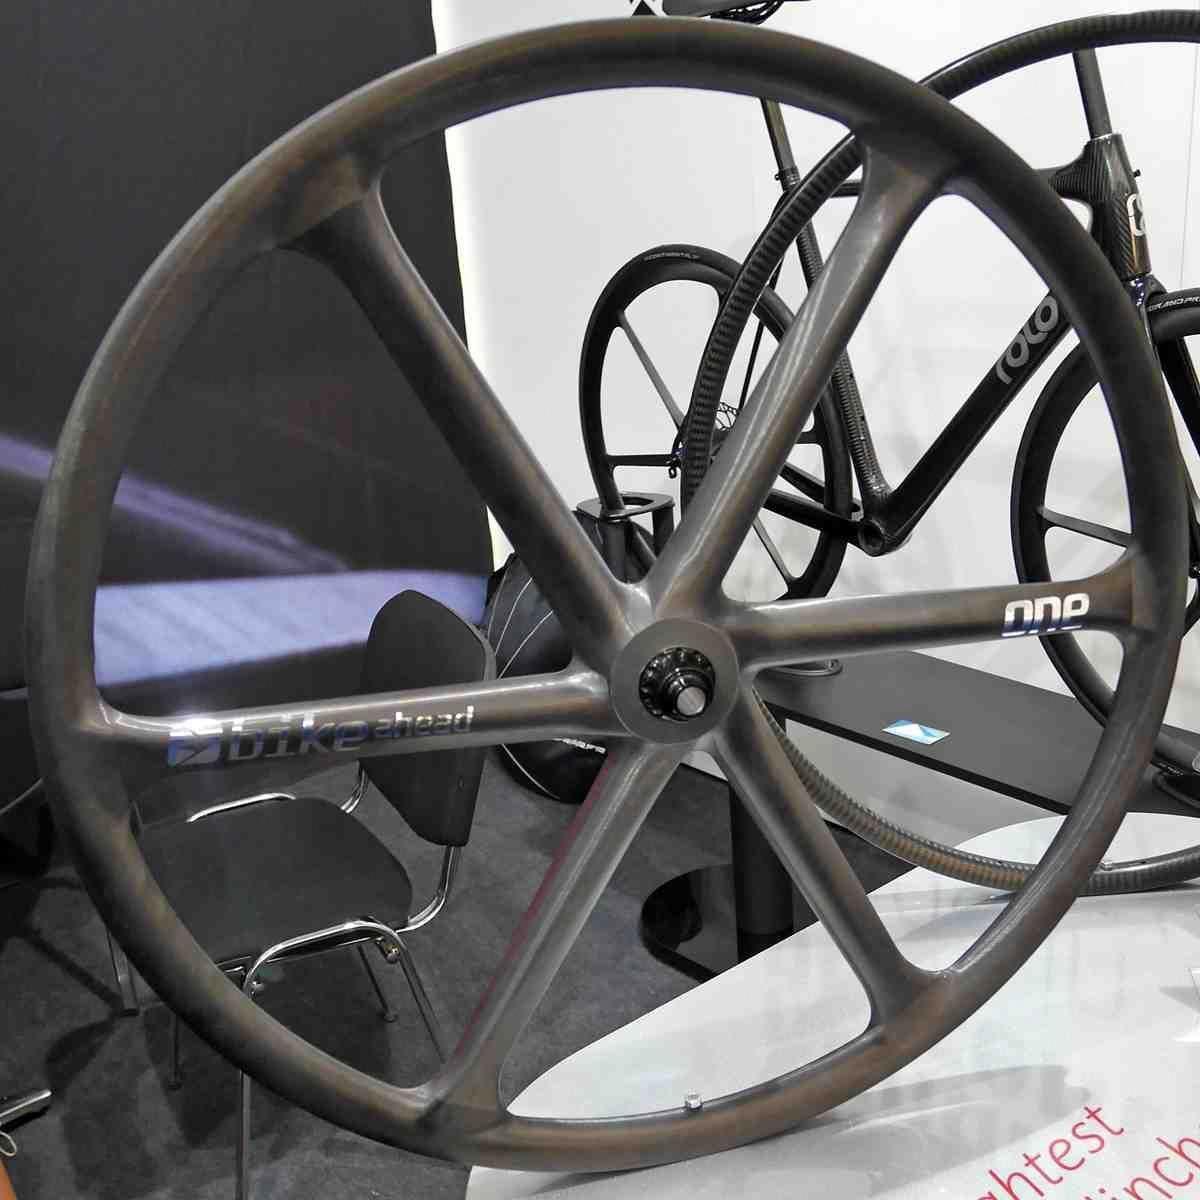 Getting The Right Bike Seat Bike Wheel Bicycle Maintenance